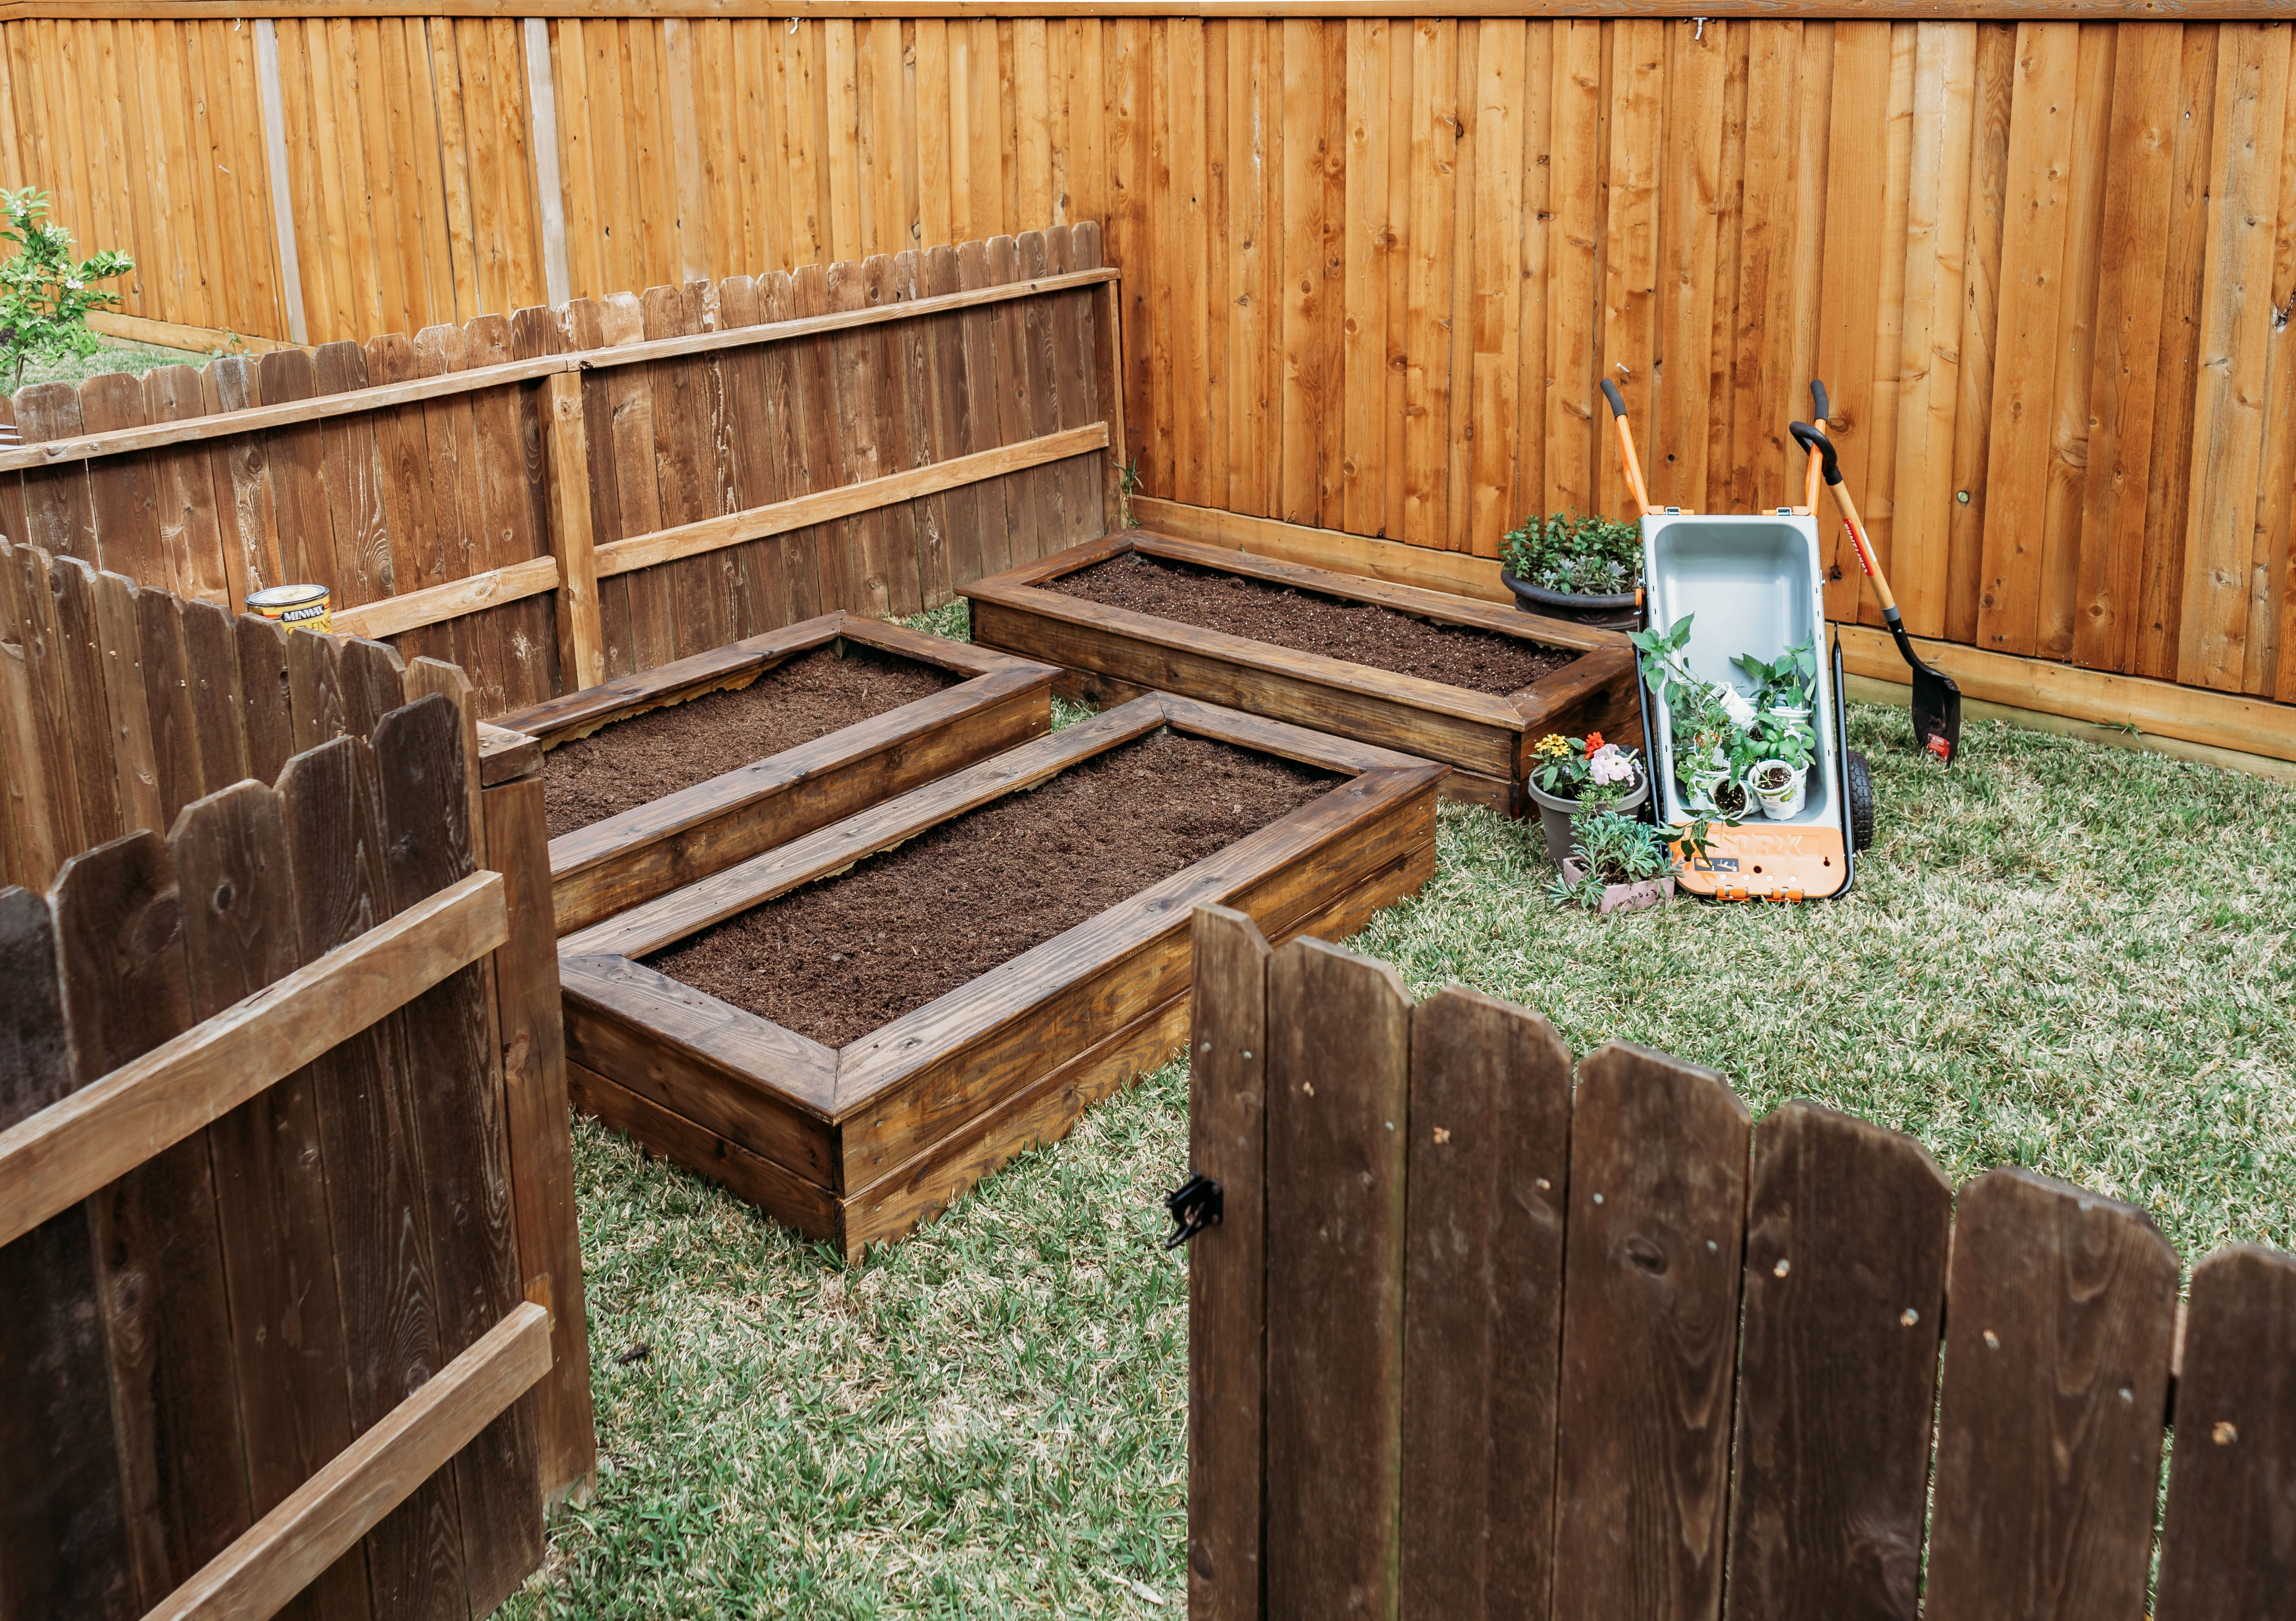 Raised Garden Bed Tutorial Raised garden beds, Garden